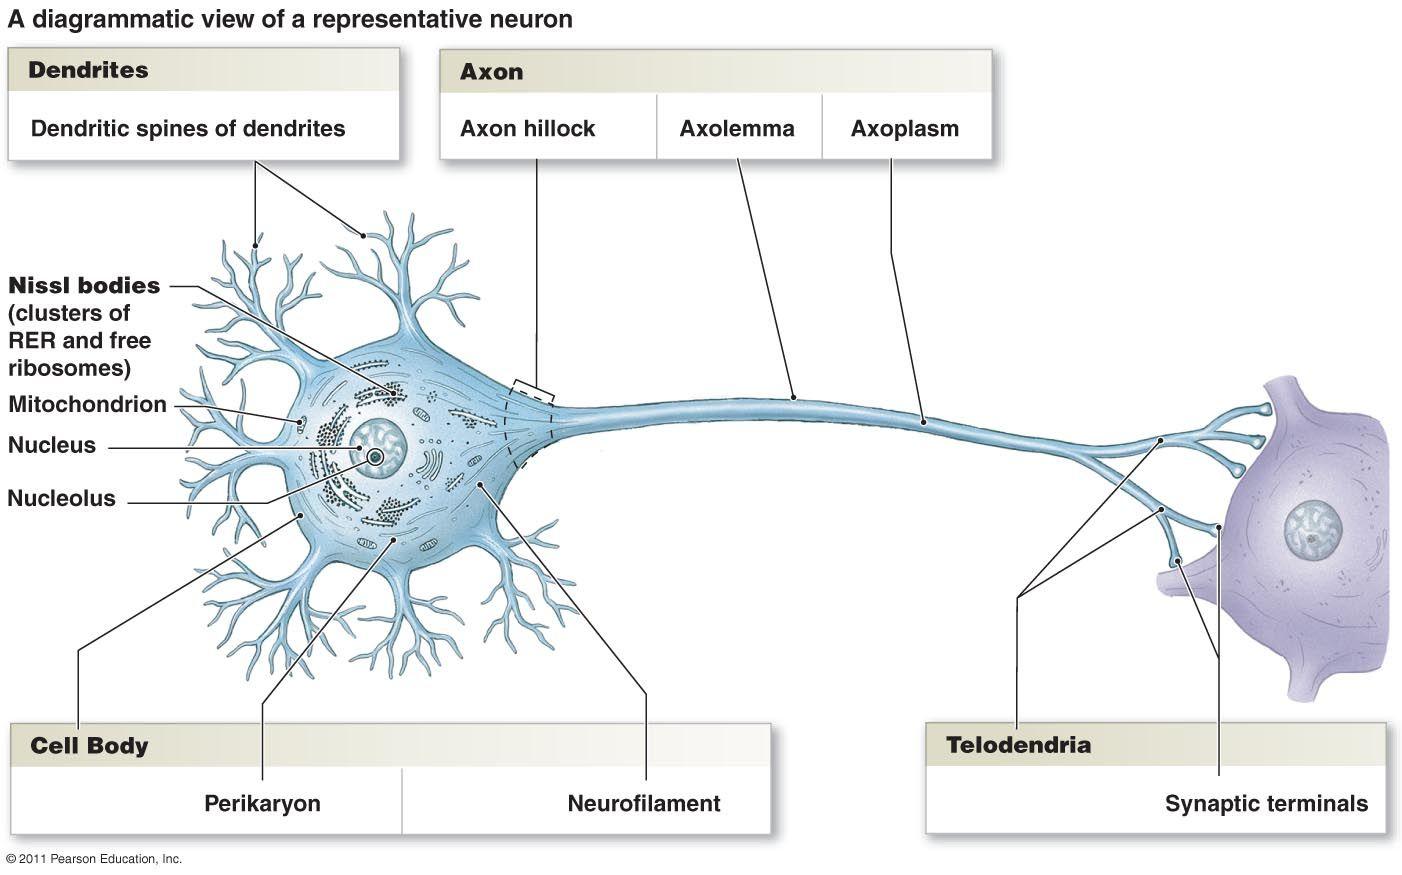 Diagrammatic View Of A Representative Neuron